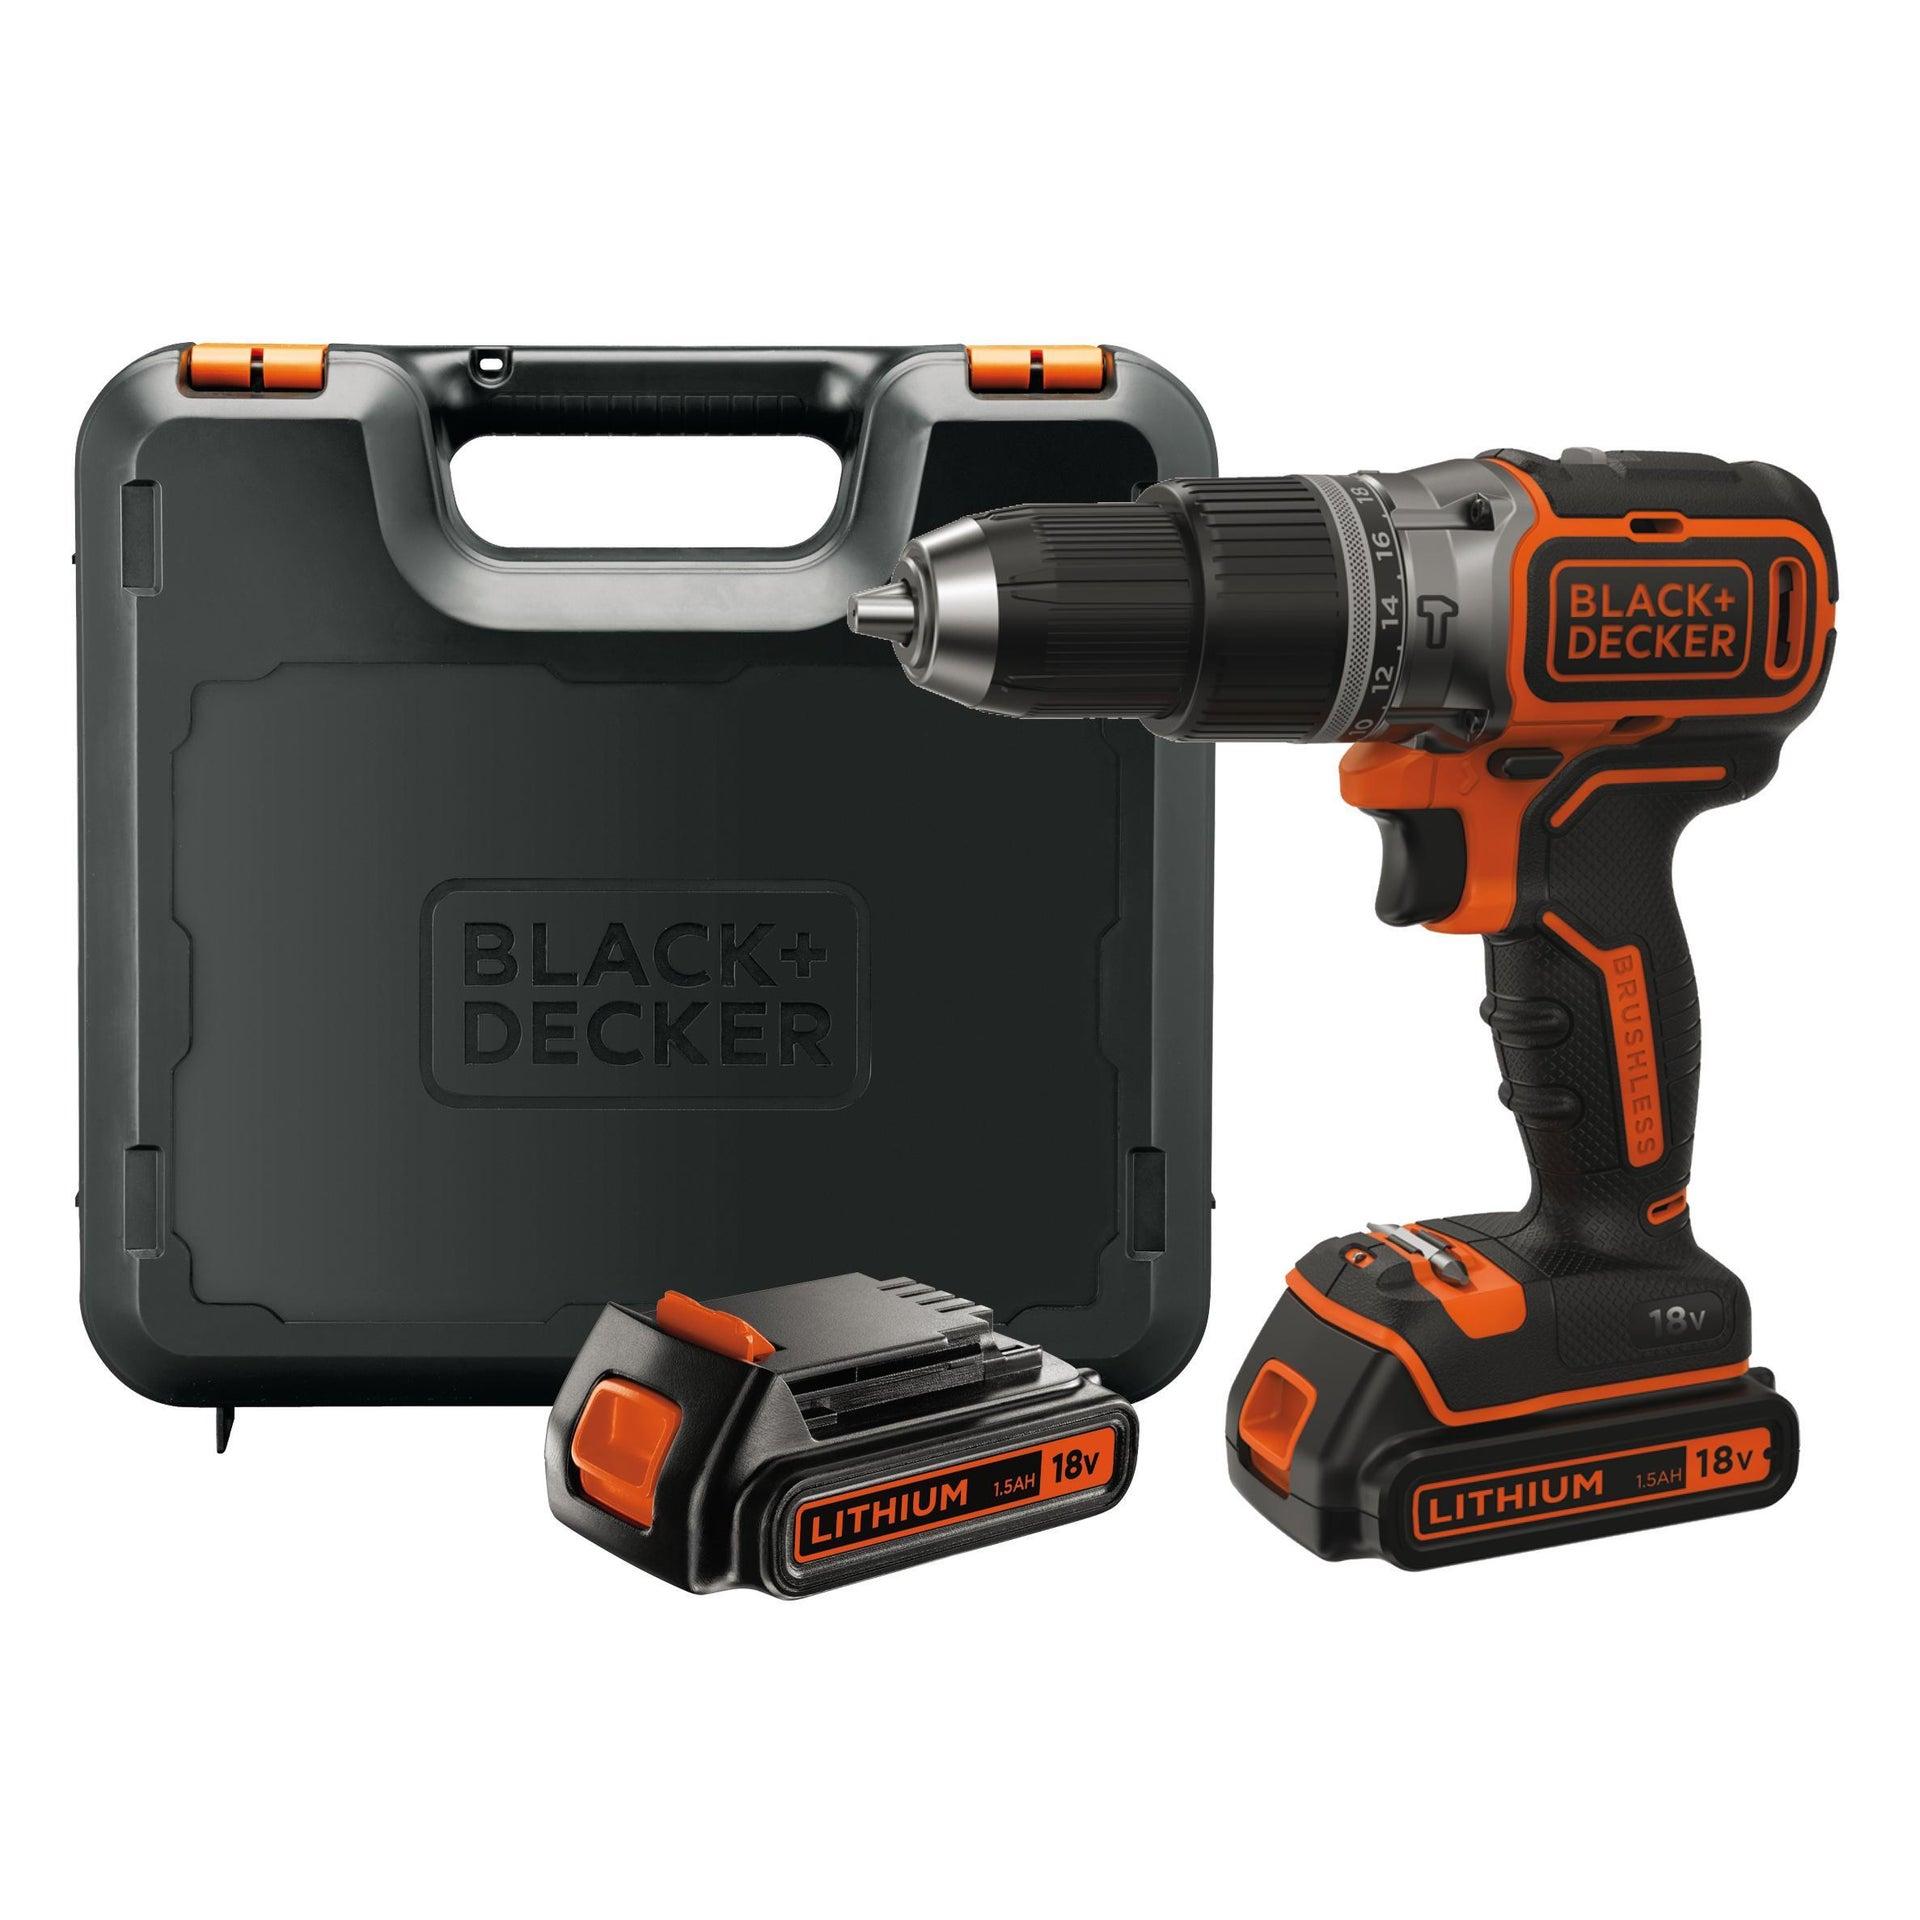 Trapano avvitatore a batteria BLACK + DECKER BL188KB-QW 18 V, 1.5 Ah, 2 batterie - 7